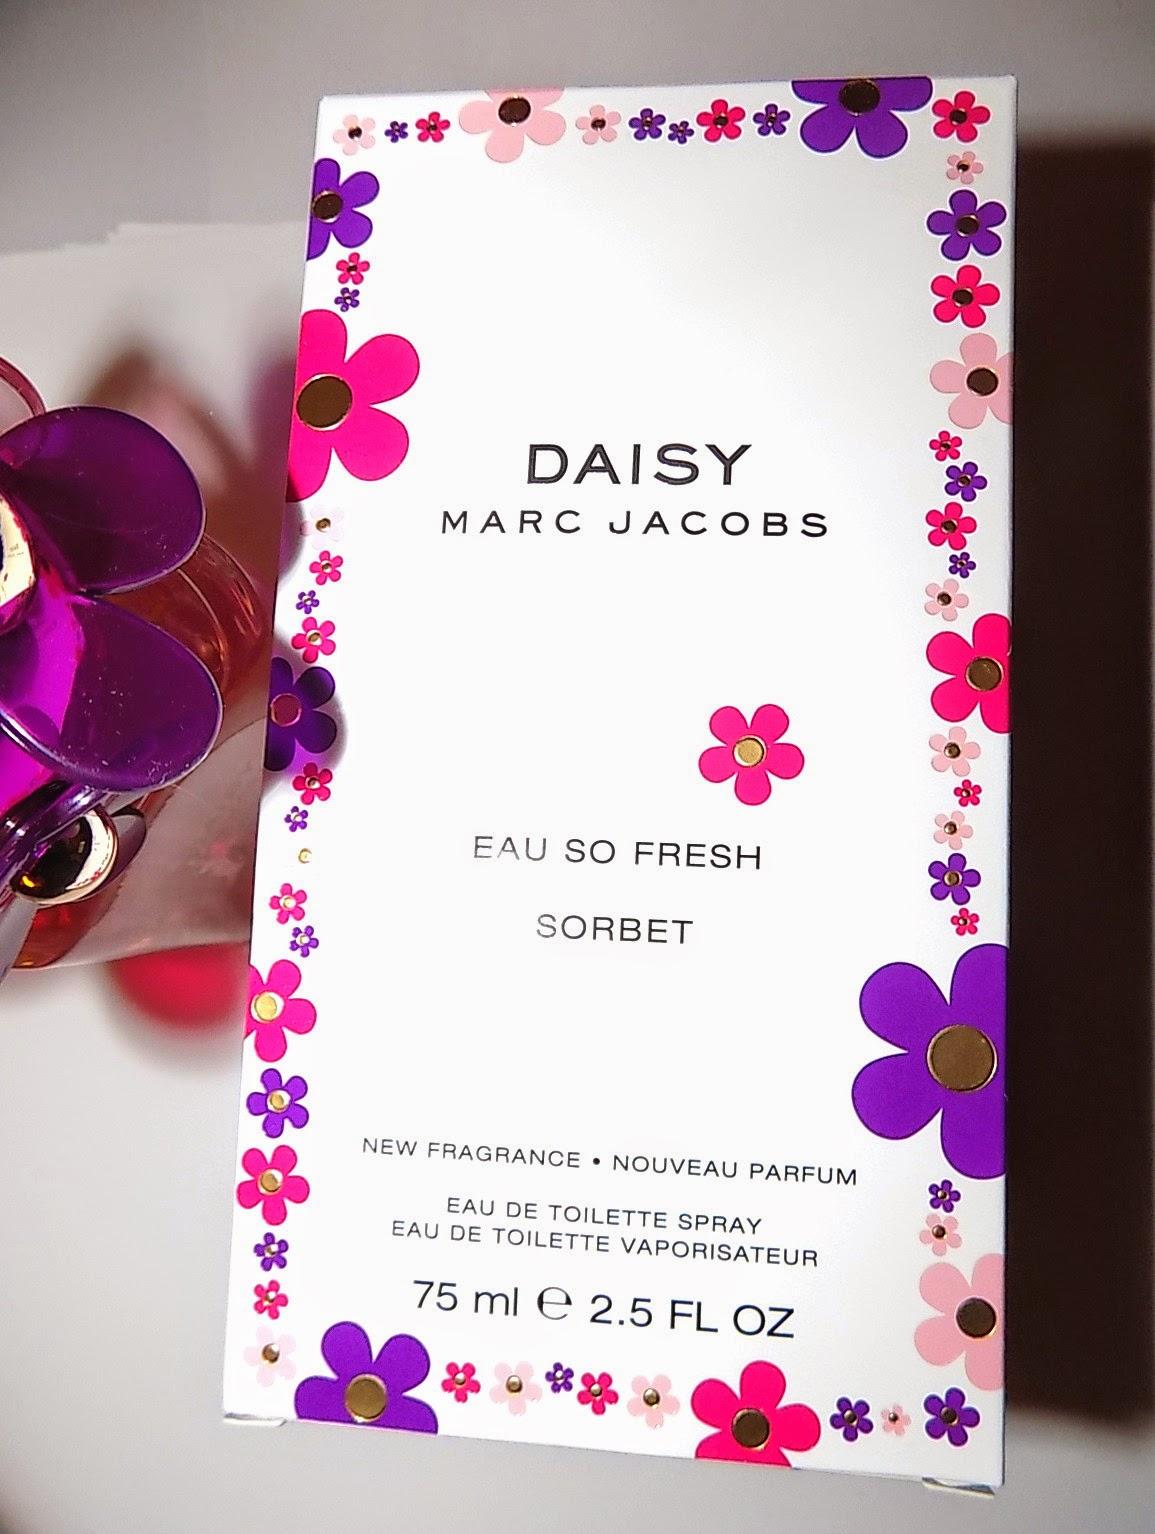 the beauty alchemist marc jacobs daisy eau so fresh sorbet. Black Bedroom Furniture Sets. Home Design Ideas